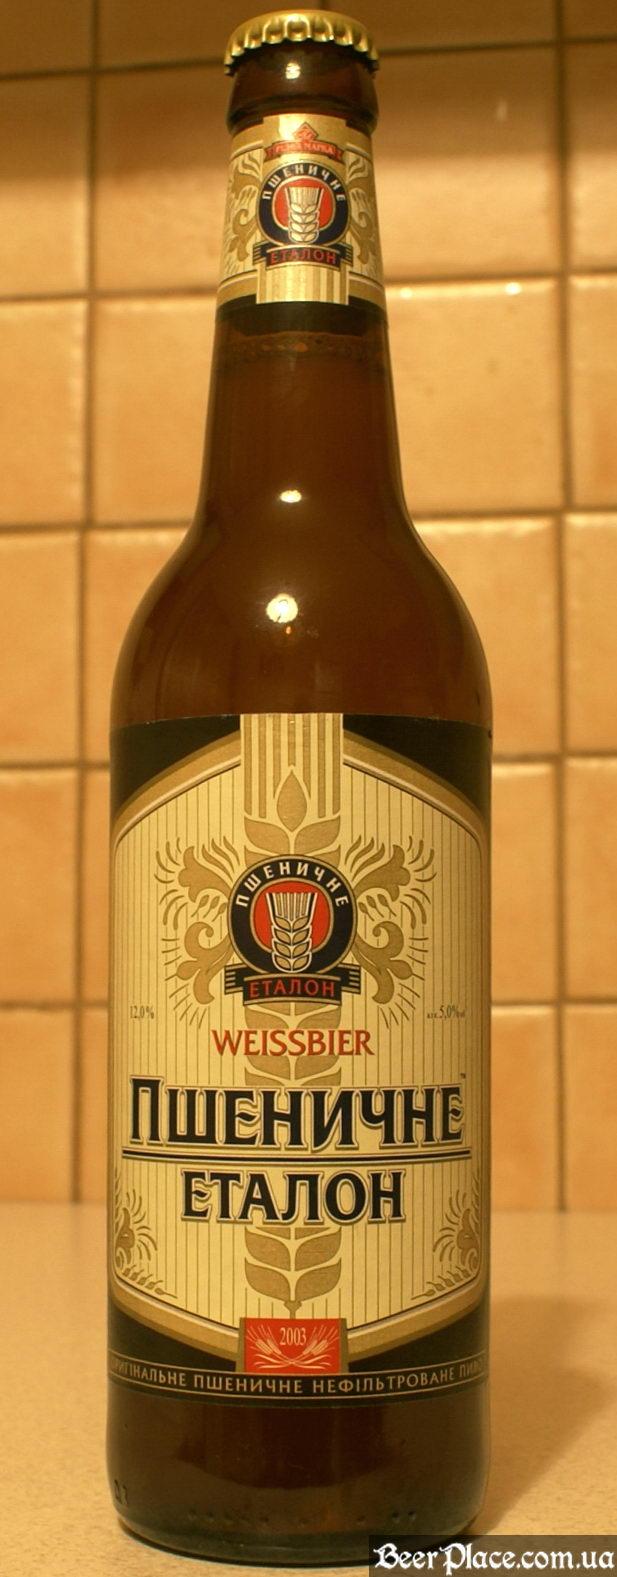 Пиво Пшеничне Еталон. Этикетка